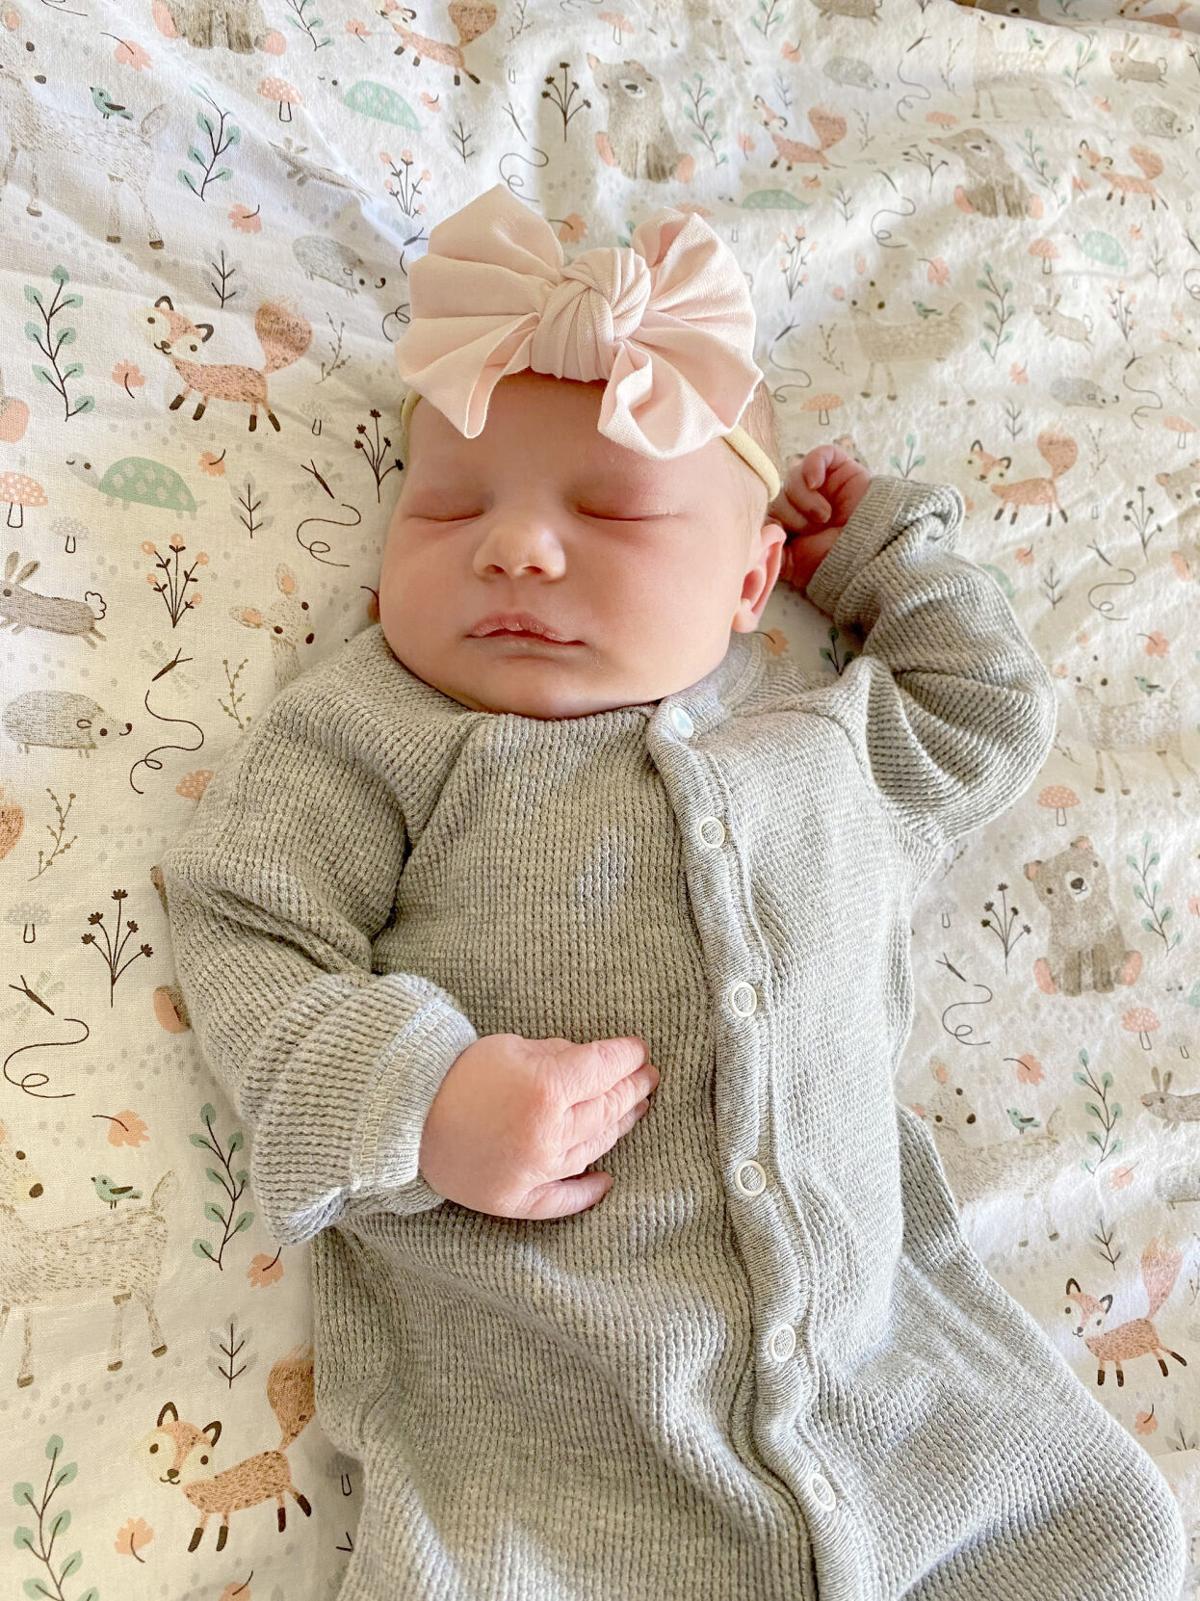 baby brandts3 21-03-31s